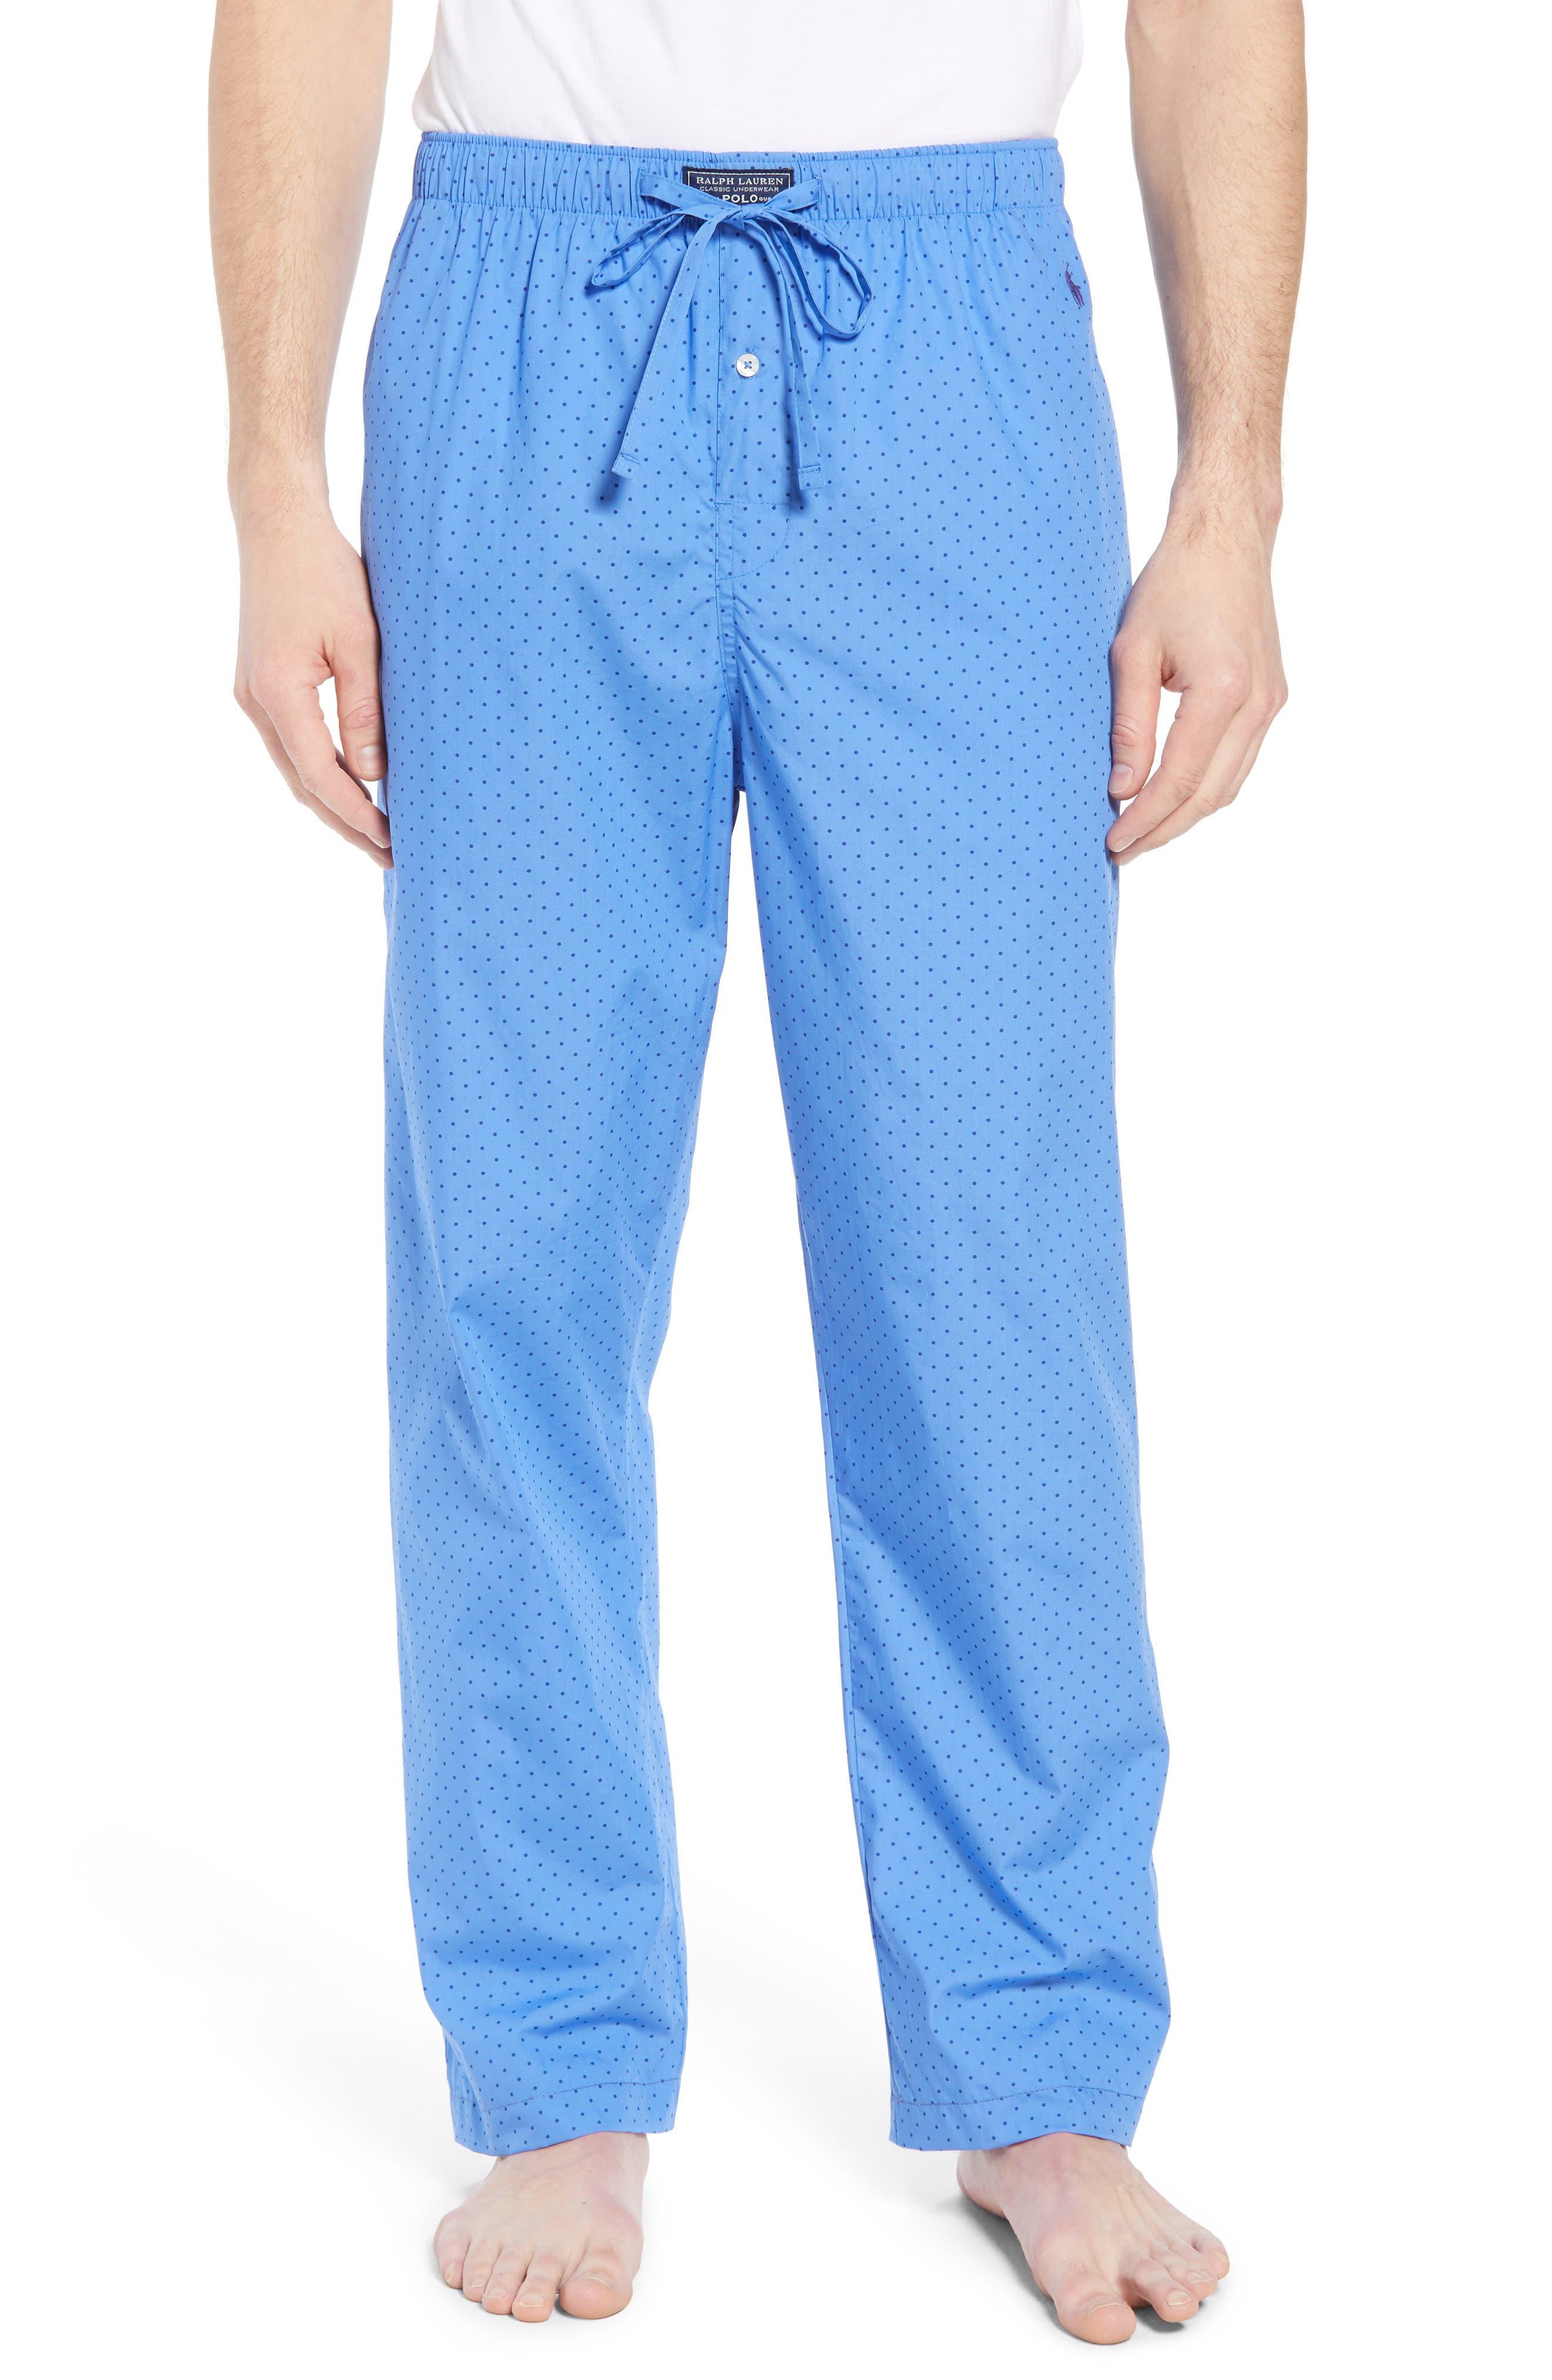 Dot Cotton Pajama Pants,                             Main thumbnail 1, color,                             451